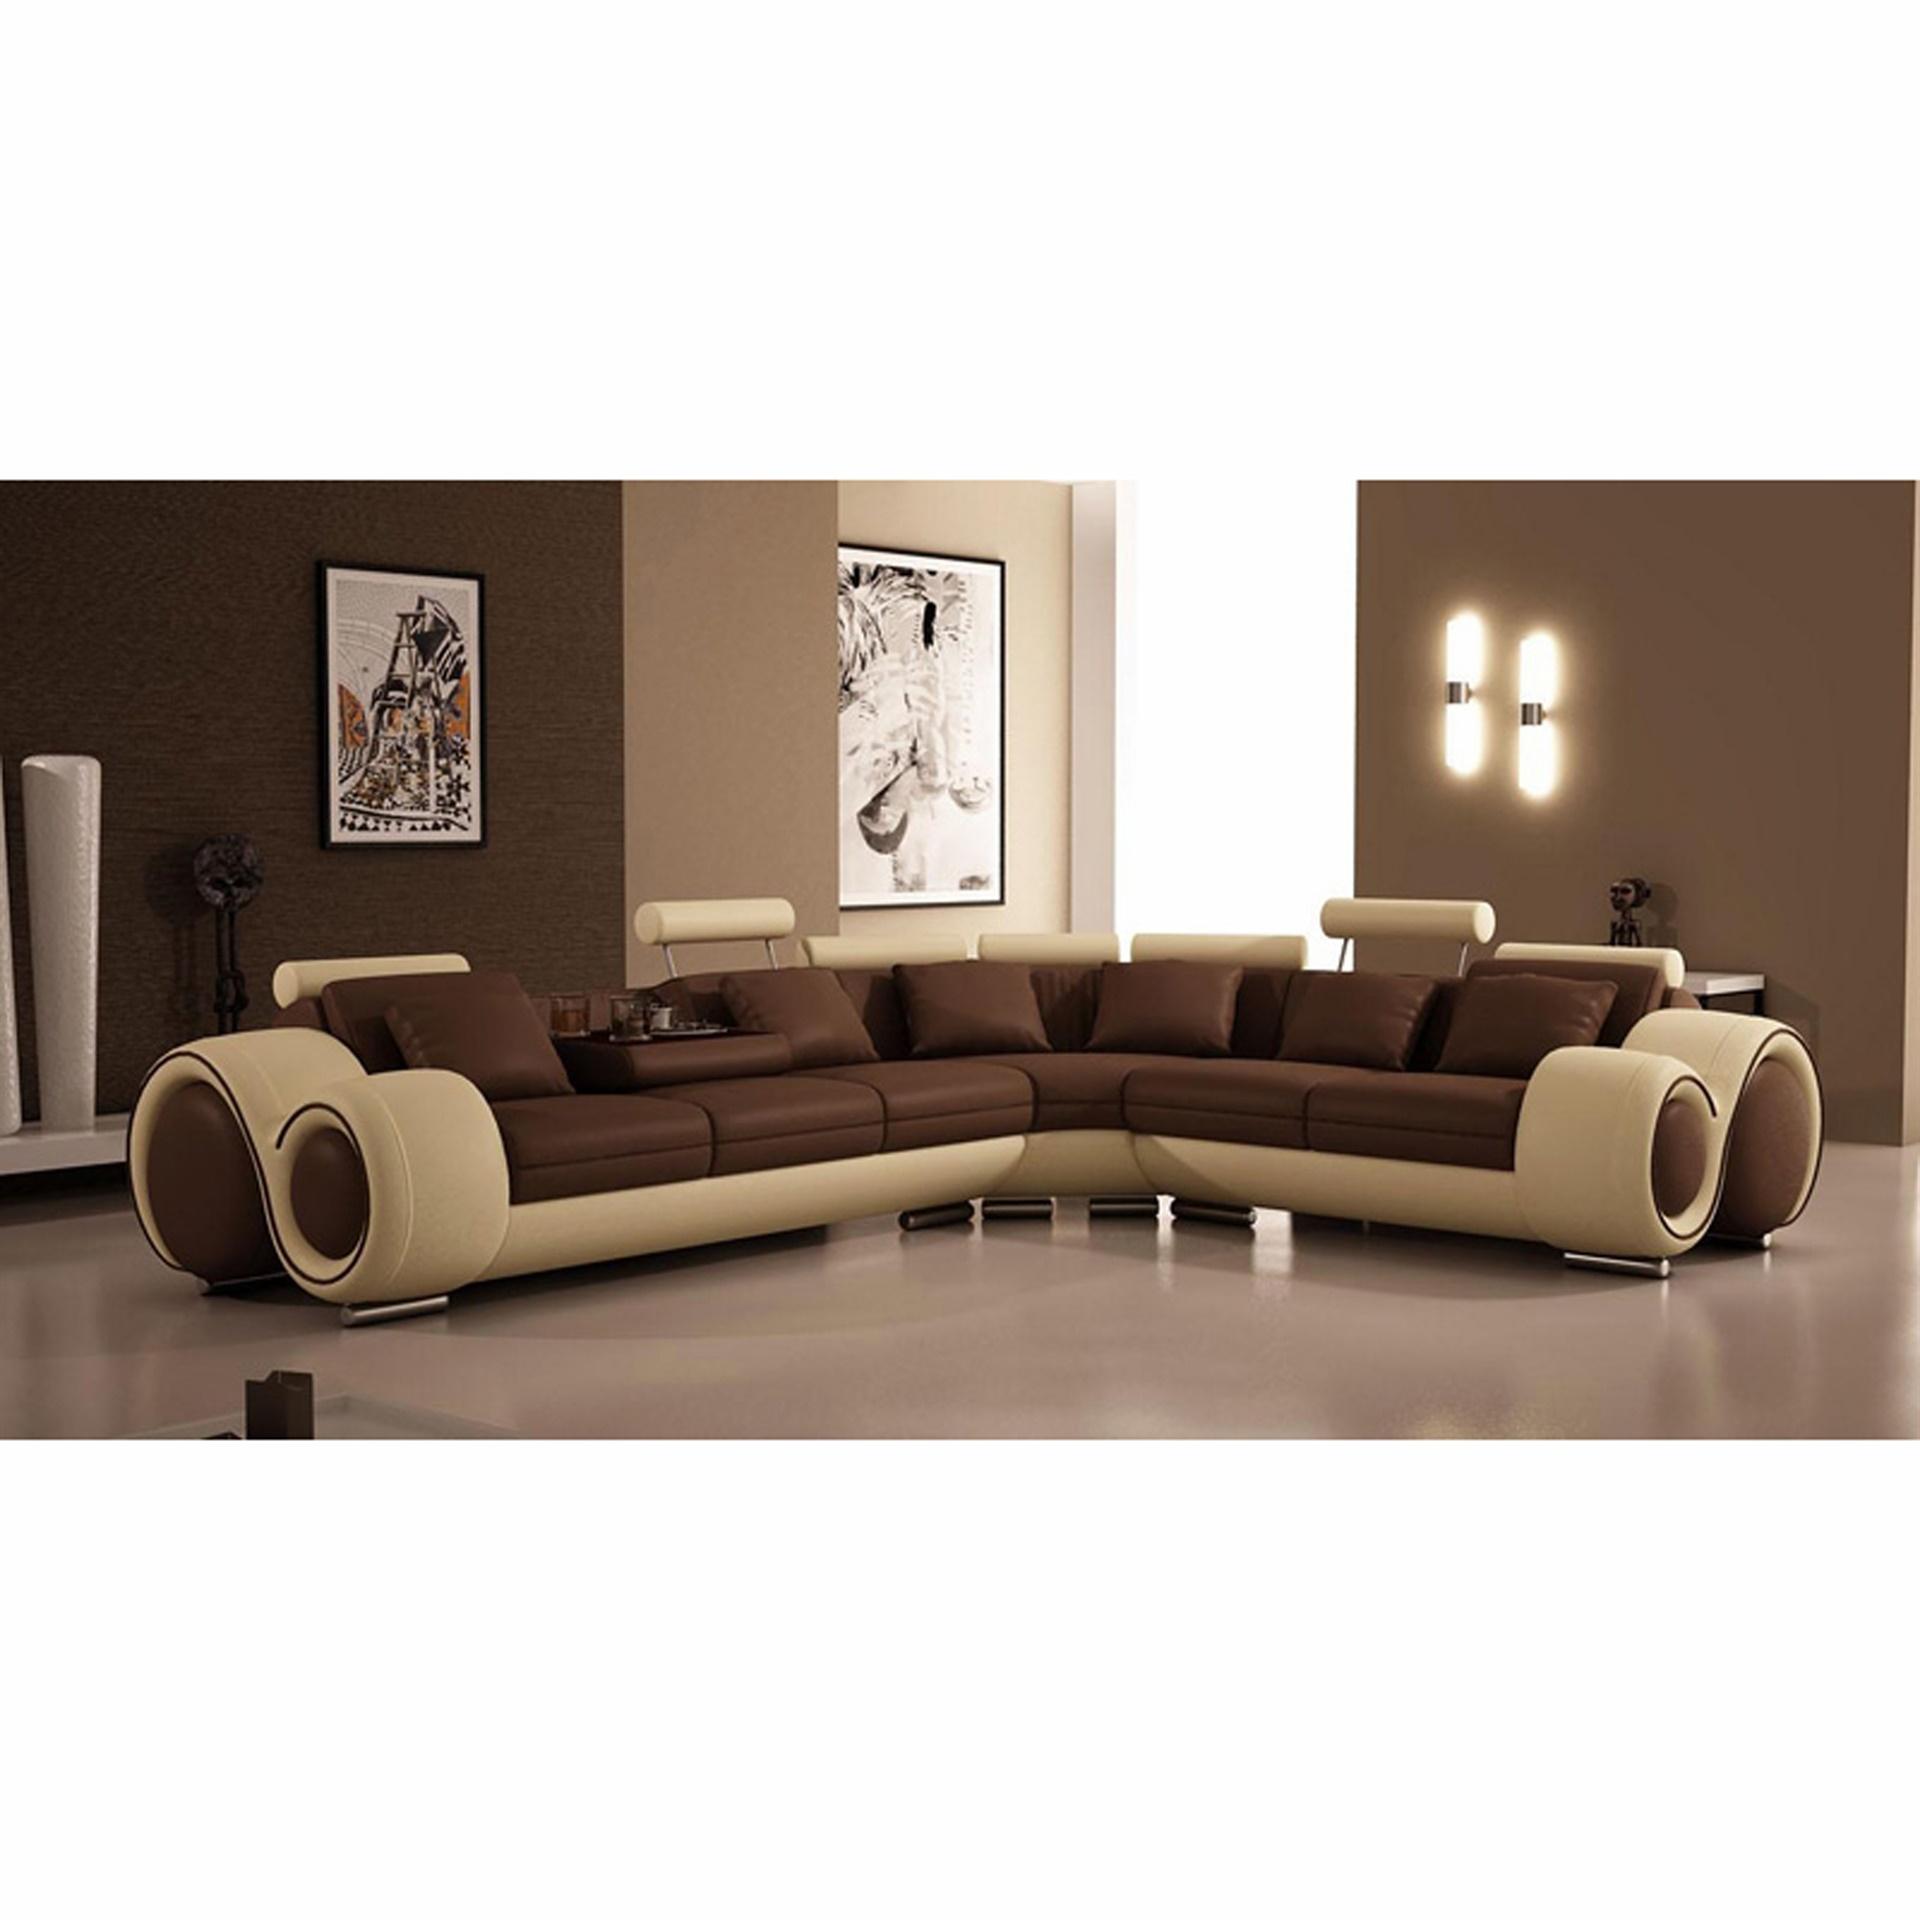 divani casa 4087 modern leather sectional sofa